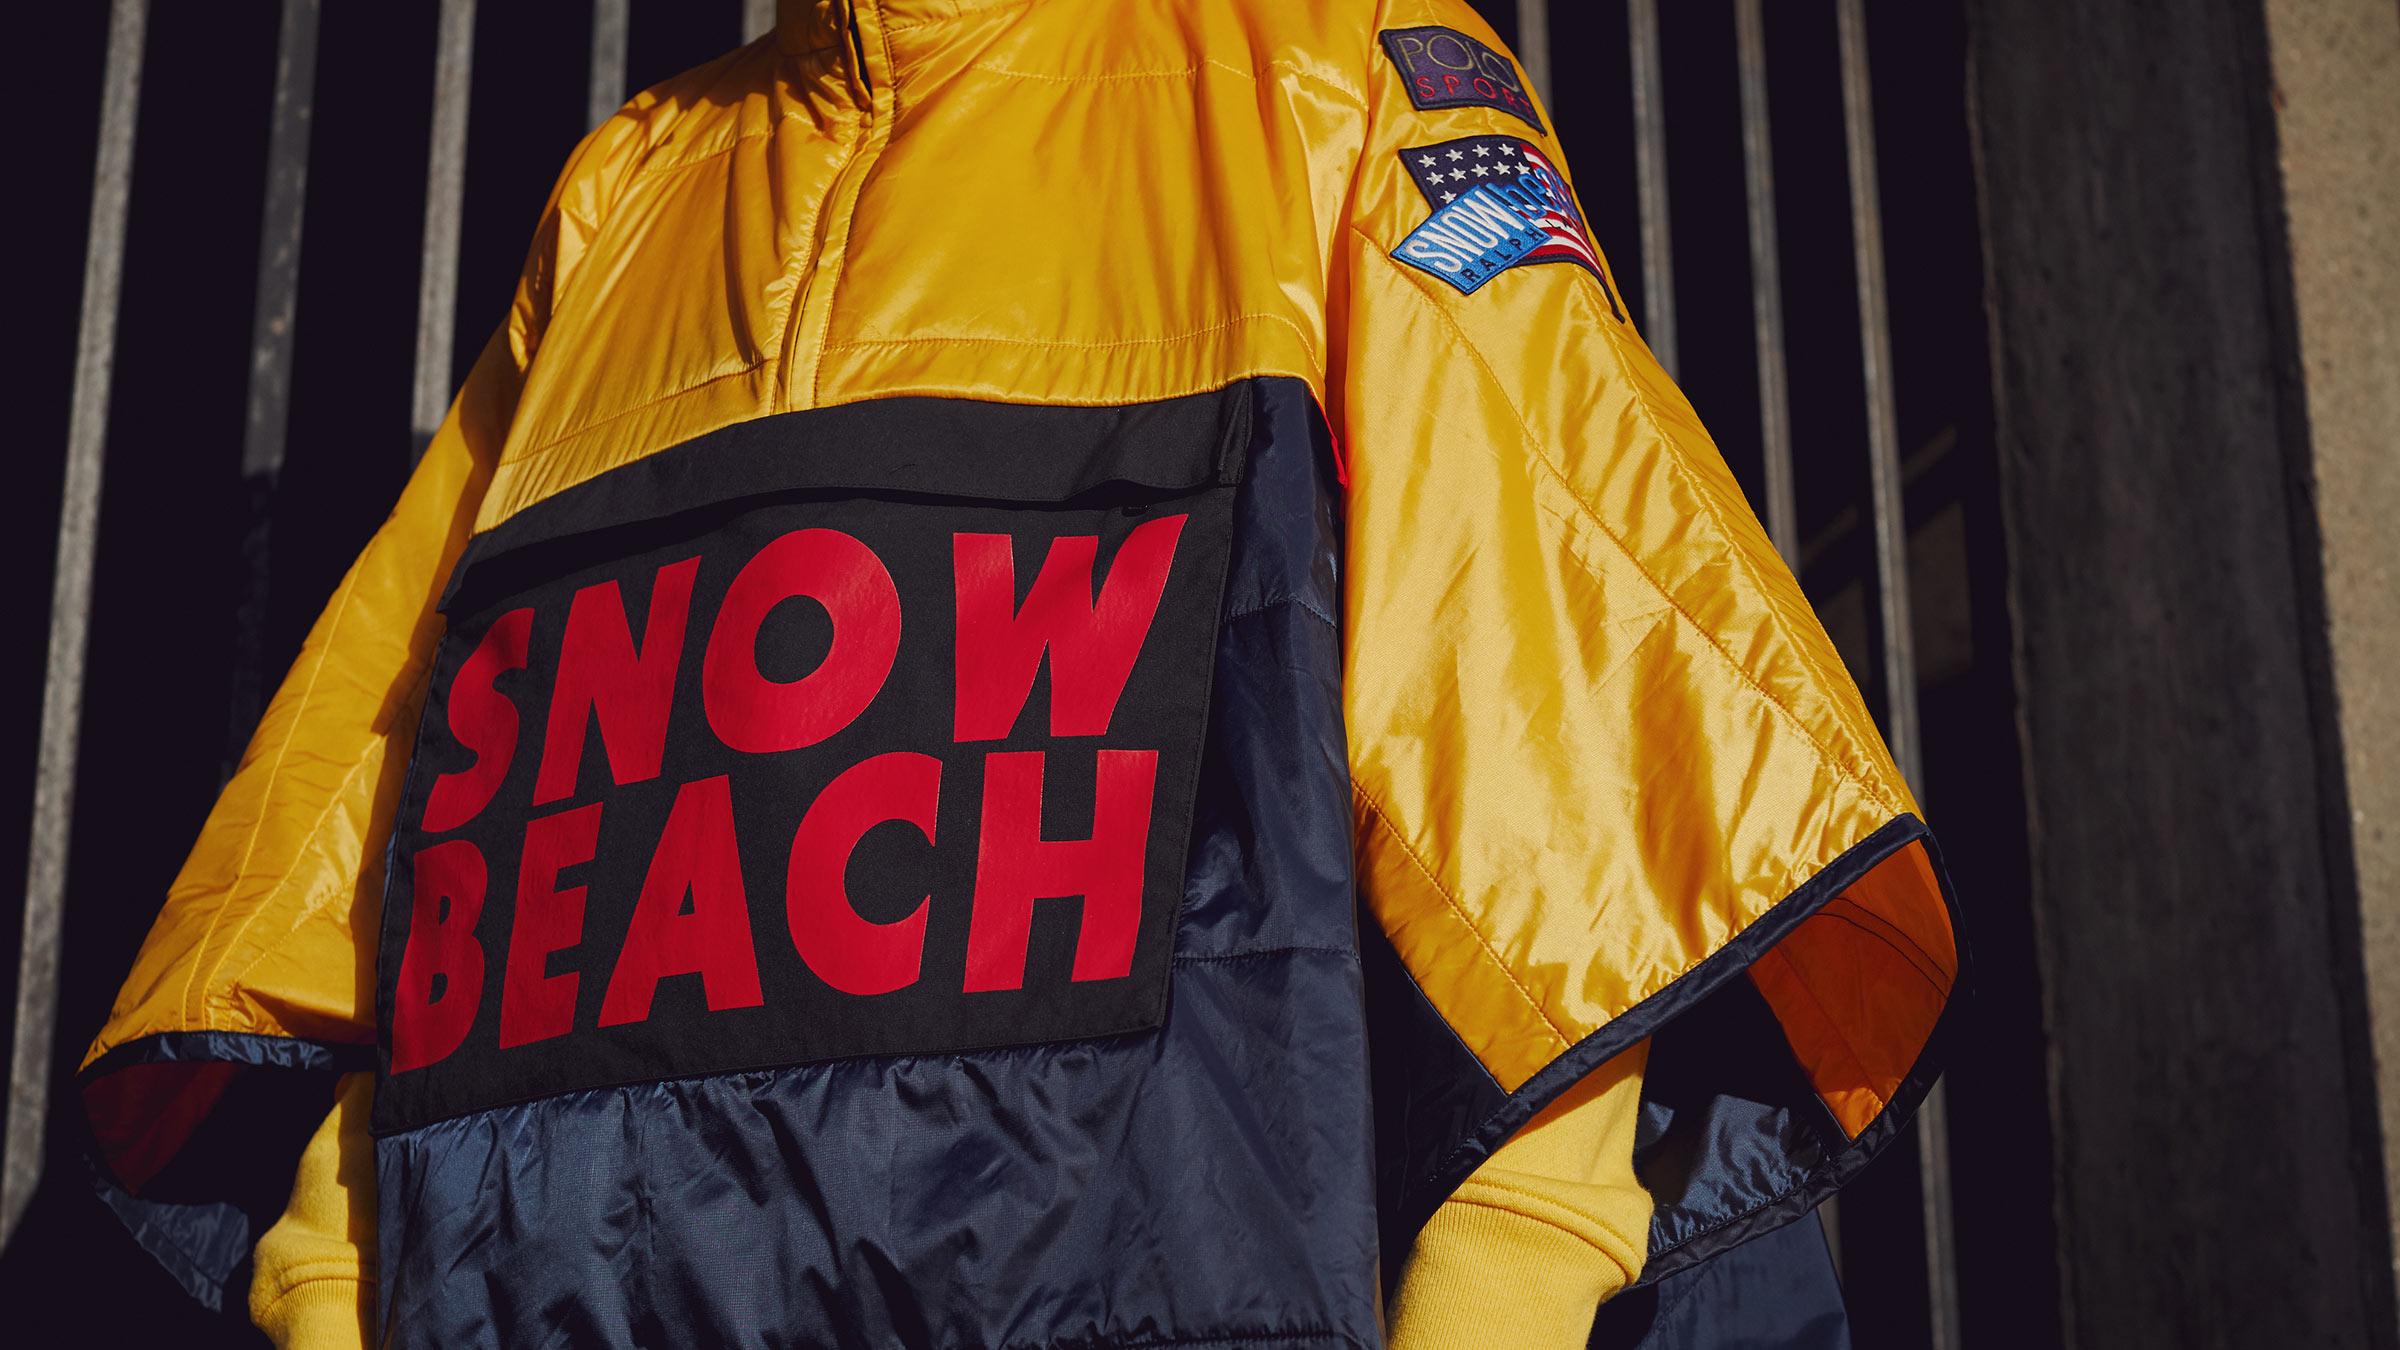 Polo Ralph Lauren Snow Beach Collection E Il Trionfo